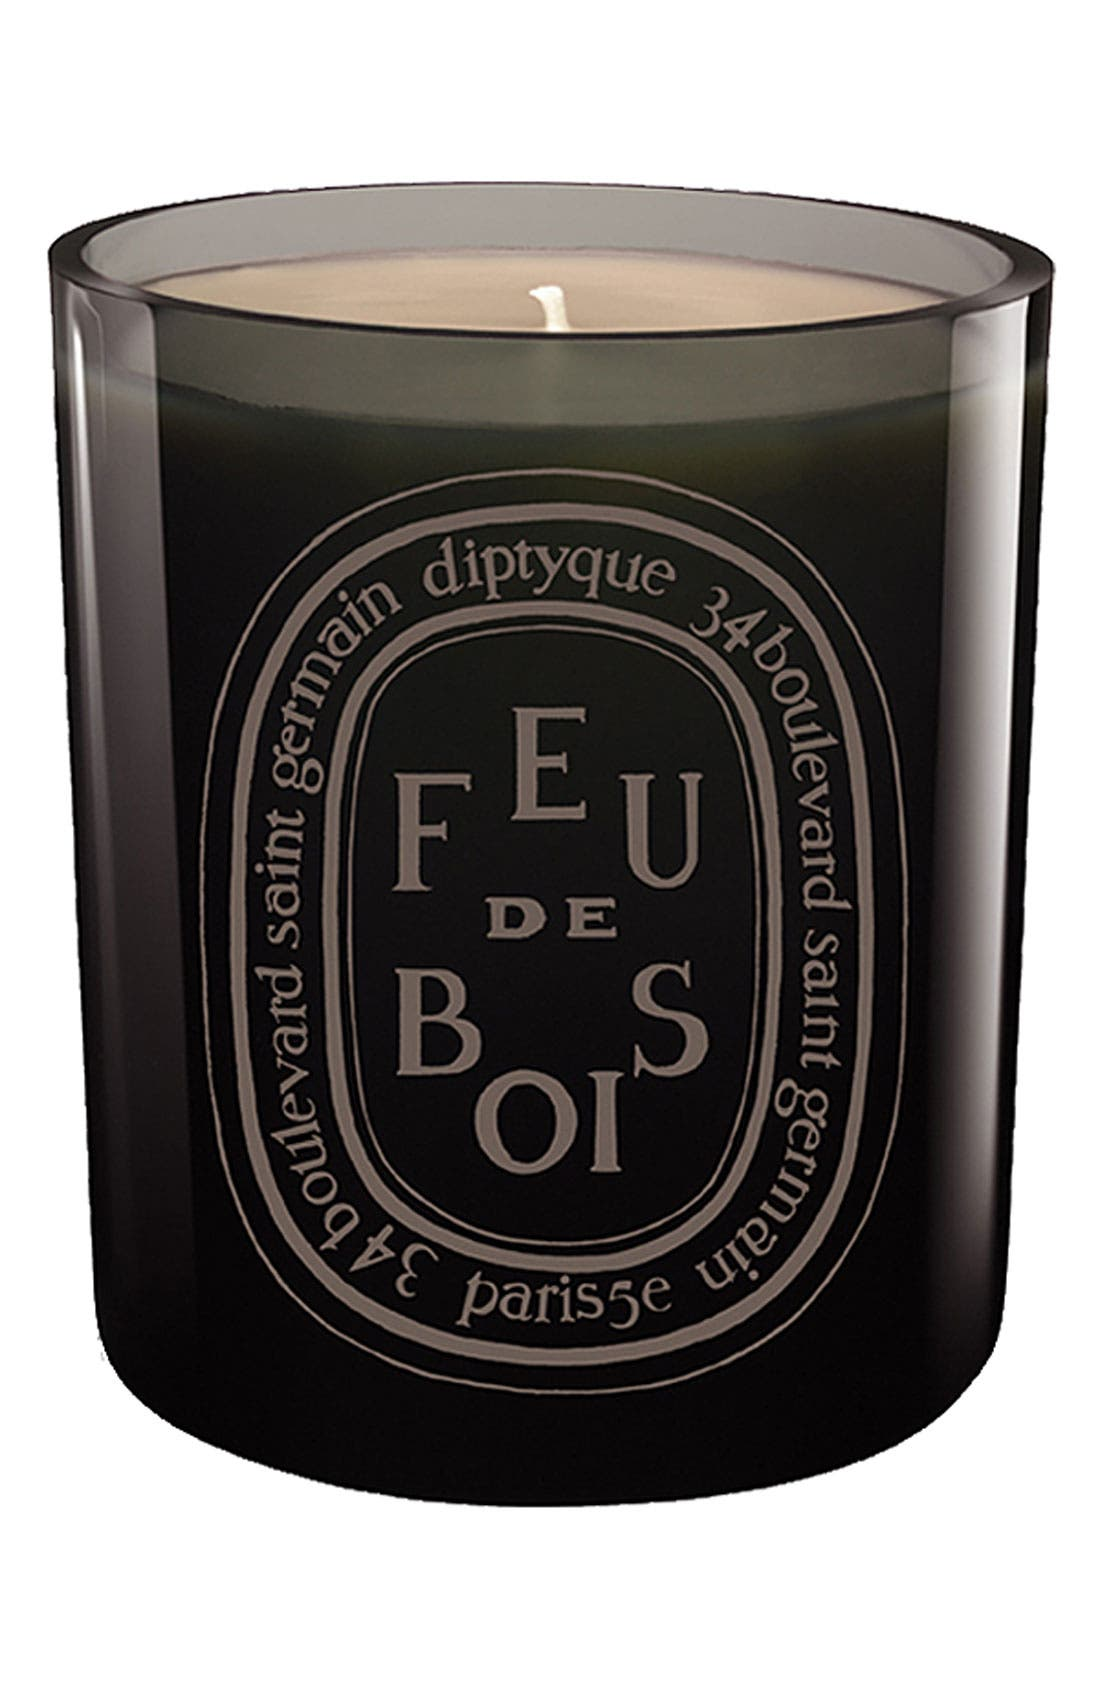 Main Image - diptyque Feu de Bois/Wood Fire Grey Scented Candle